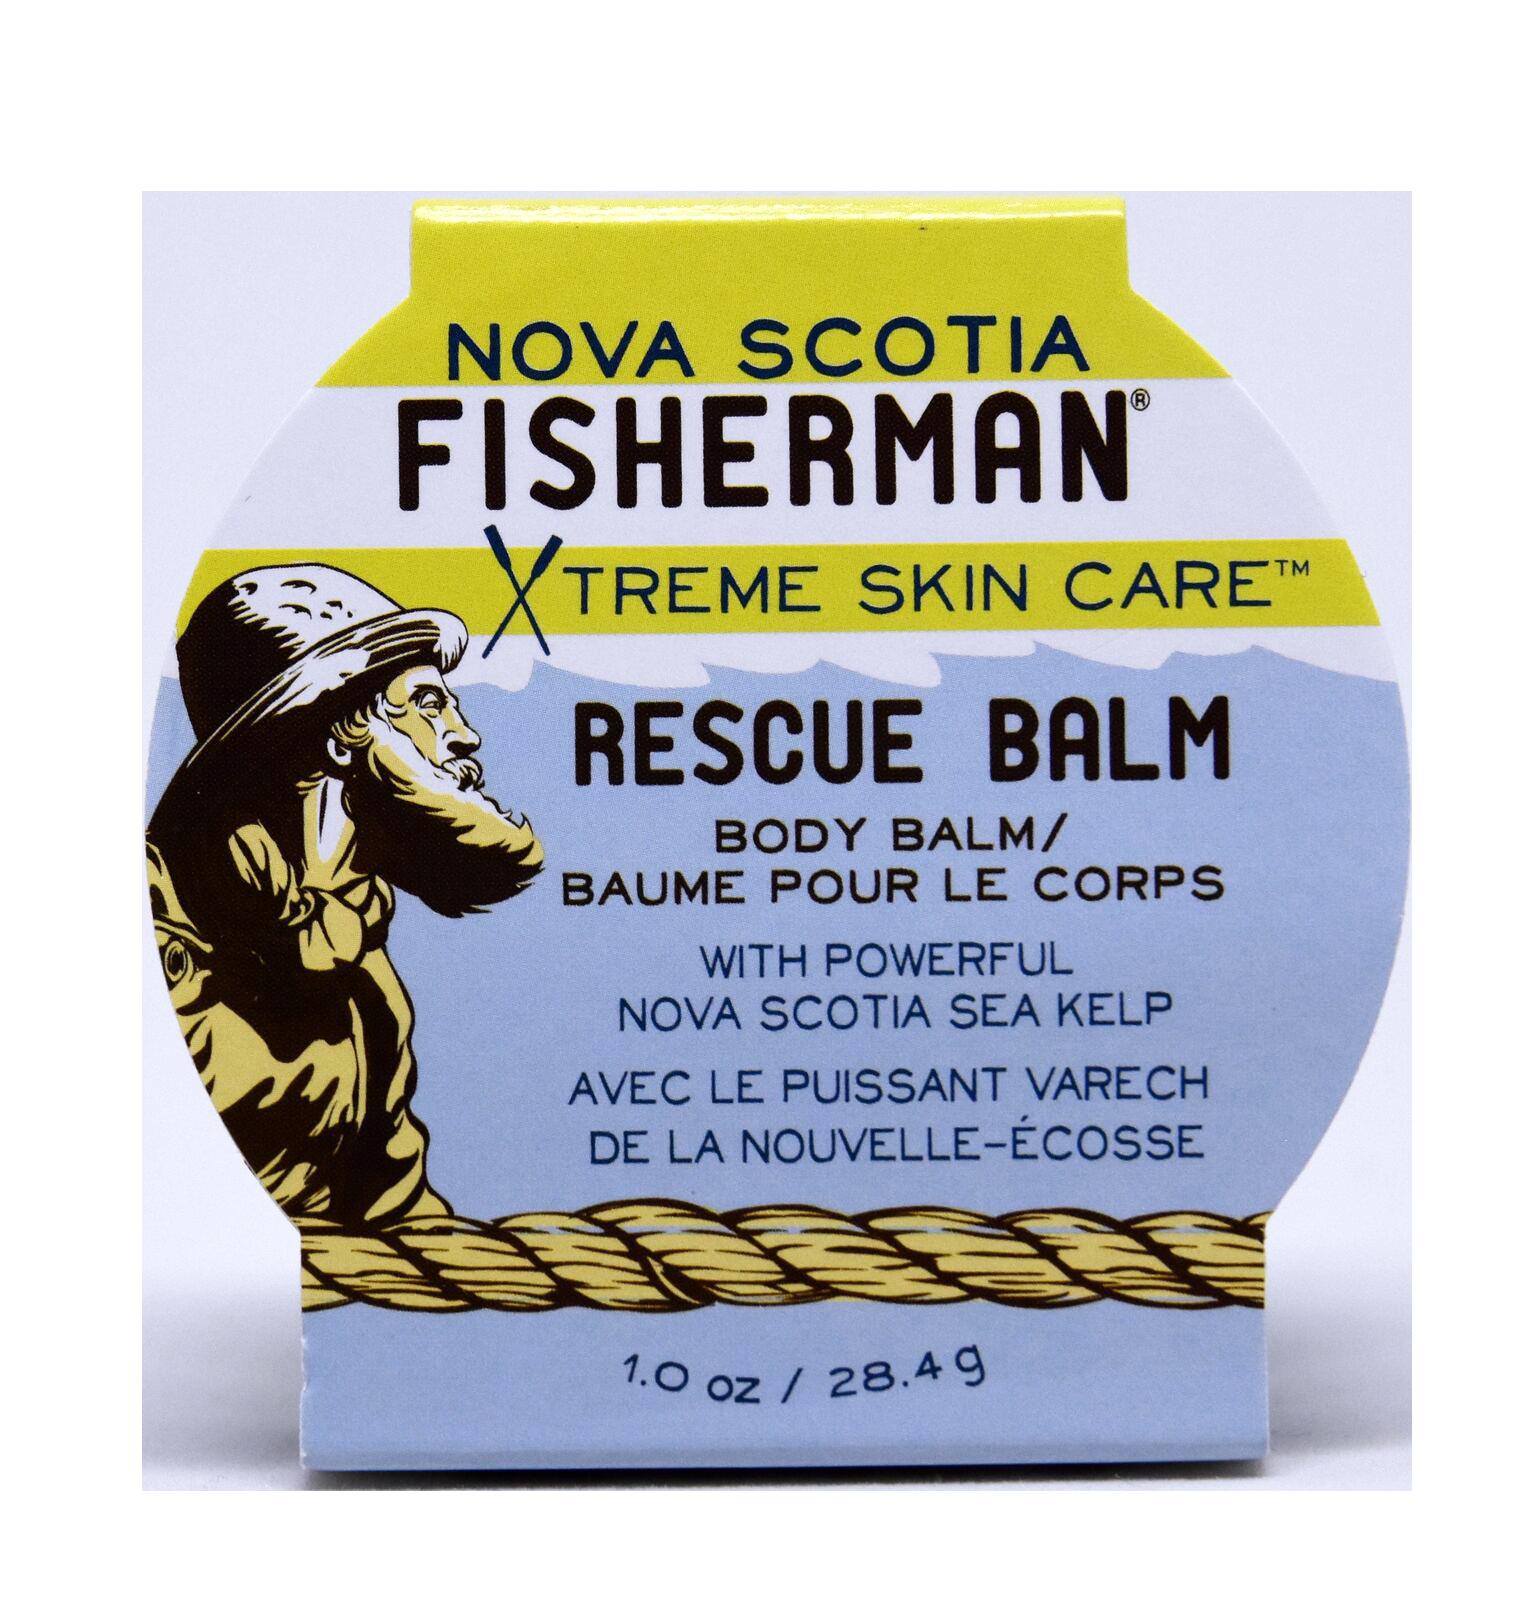 NOVA SCOTIA FISHERMAN(ノバスコシアフィッシャーマン) RESCUE BALM レスキューバーム (LARGE)